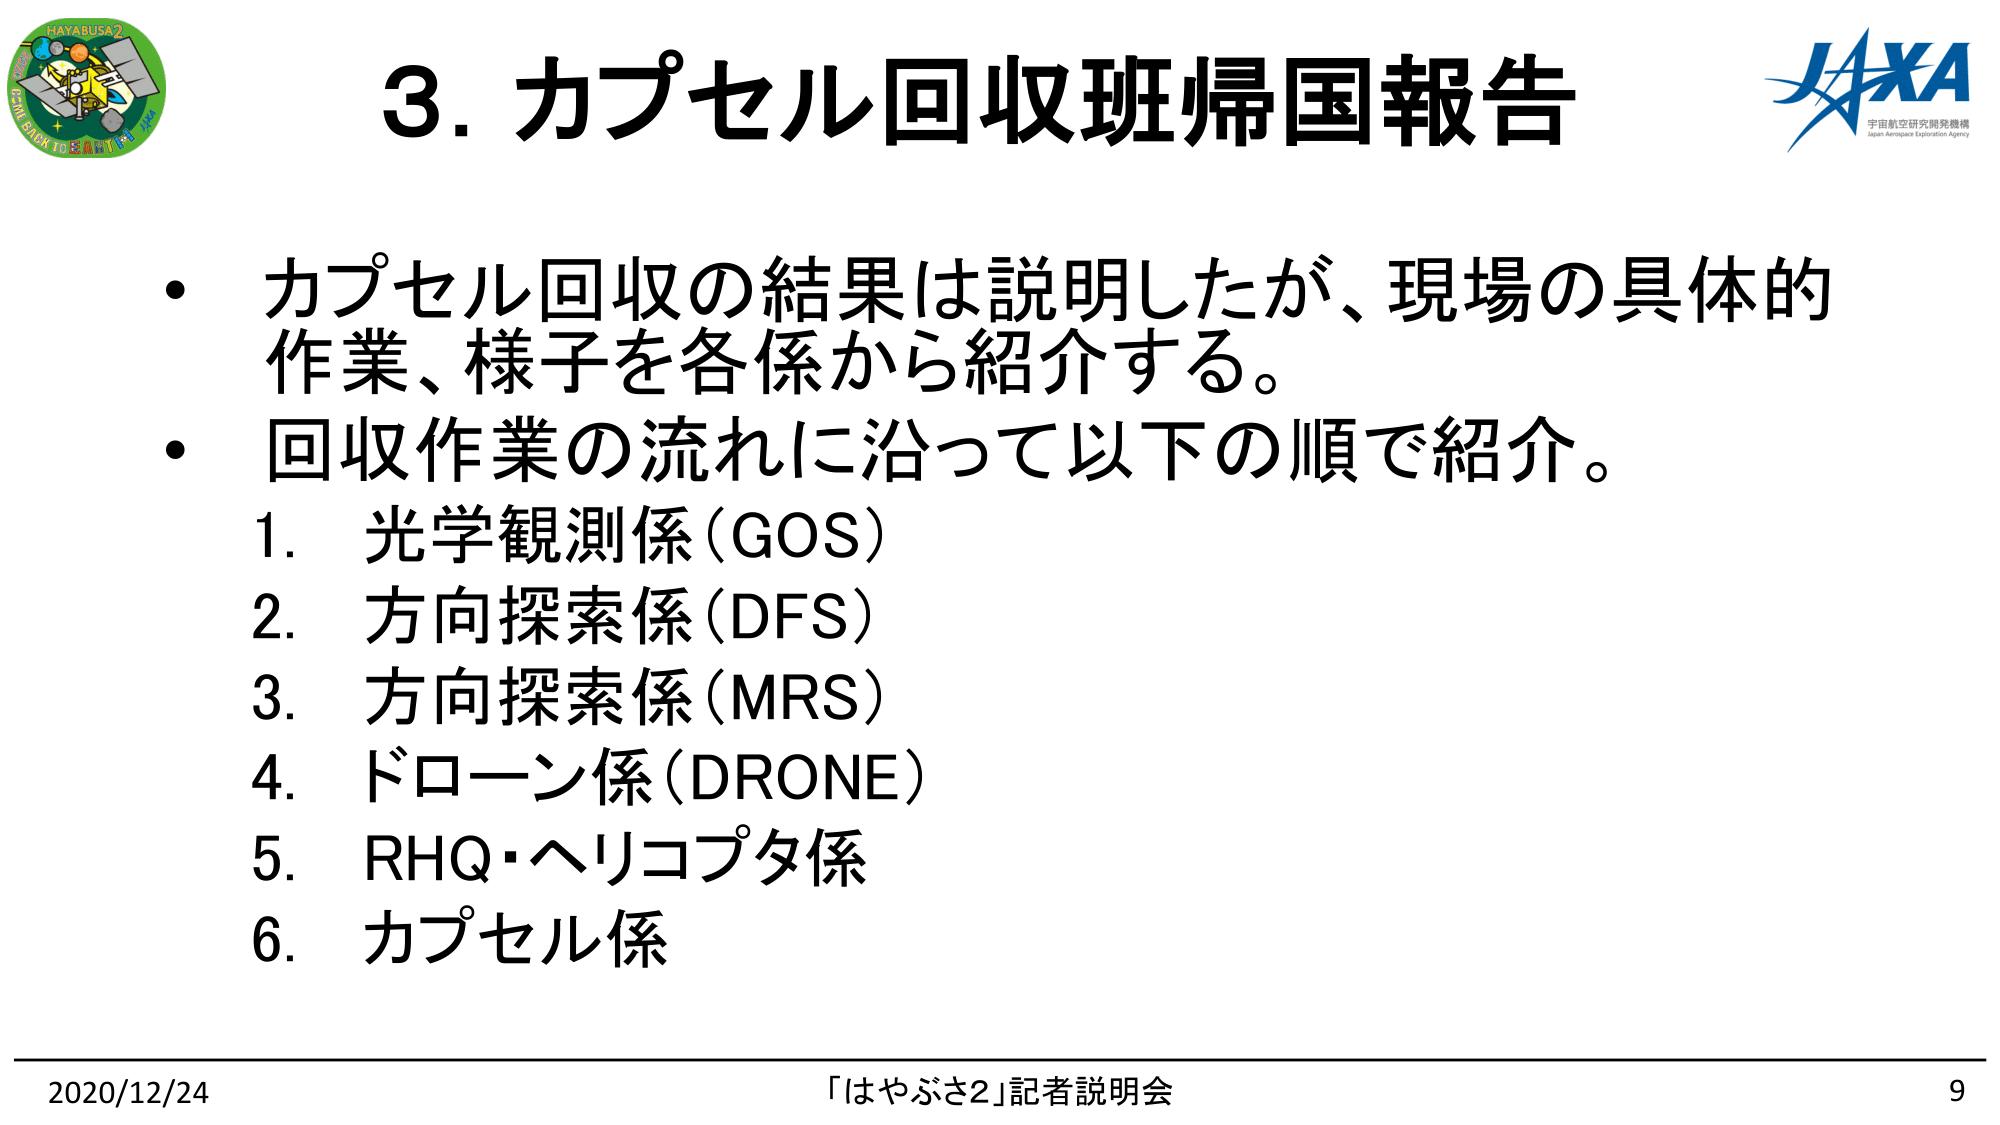 f:id:Imamura:20201224135043p:plain